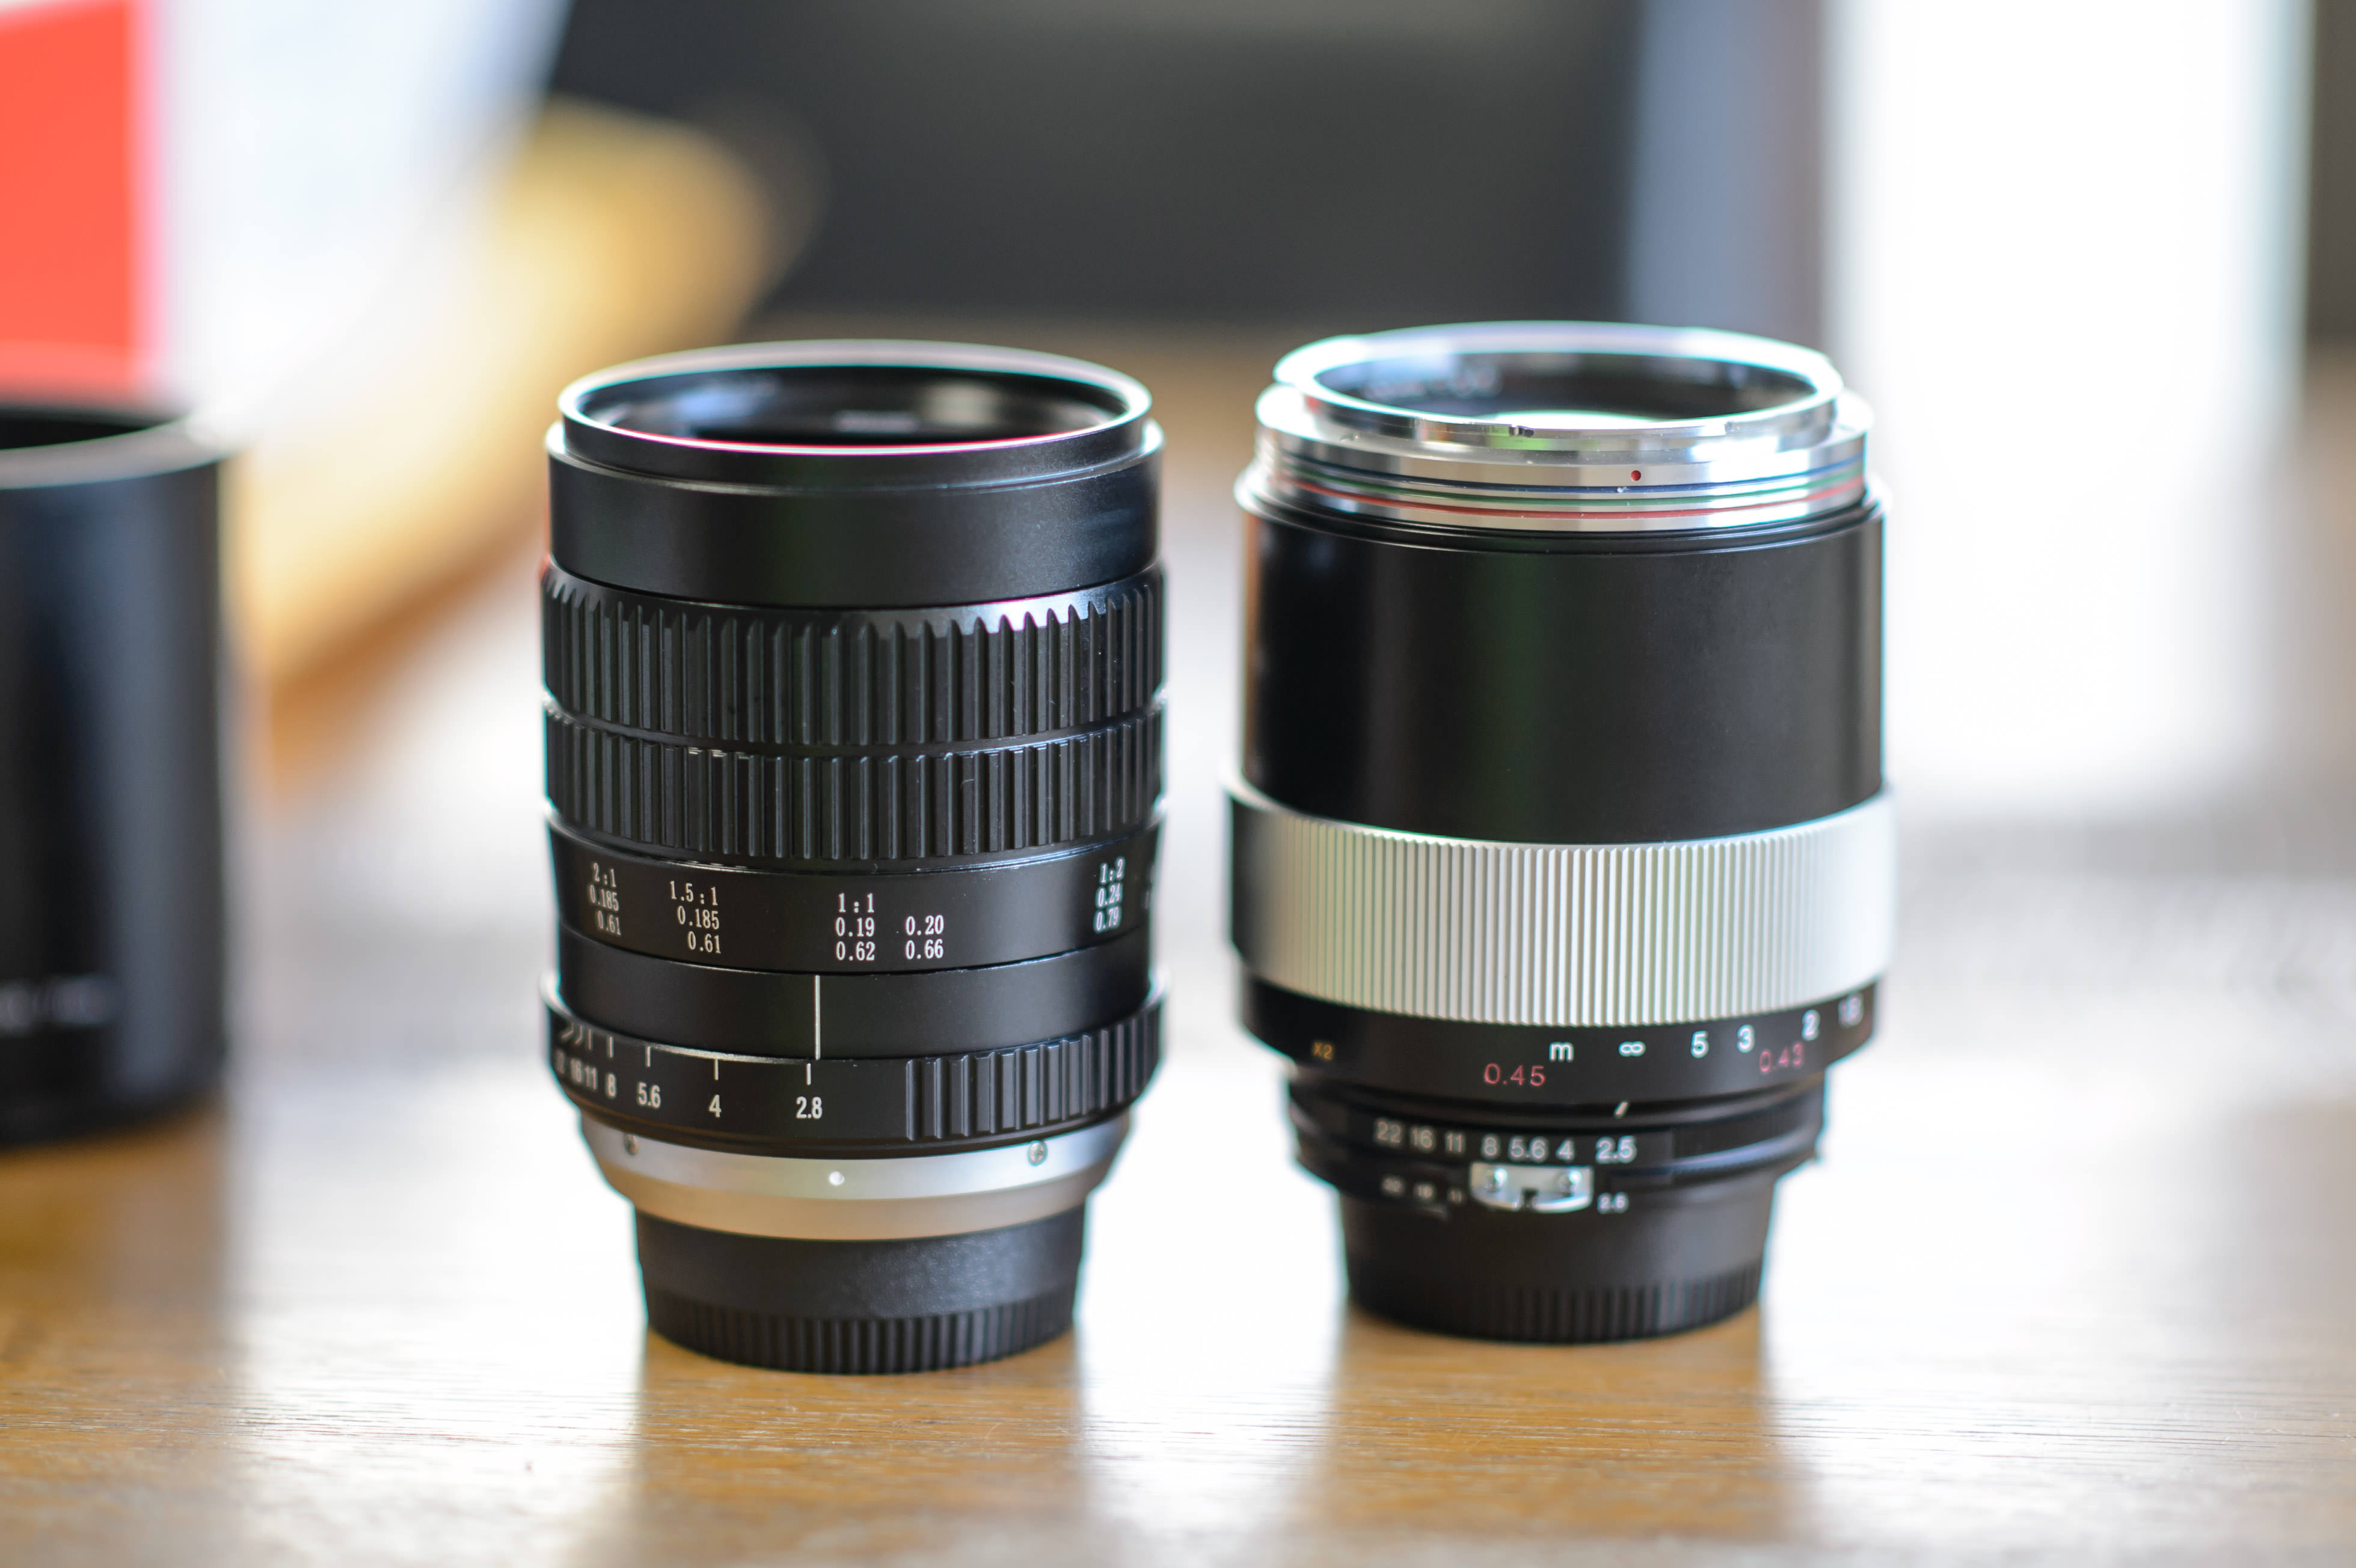 corruagation magnifyimg lense 8x